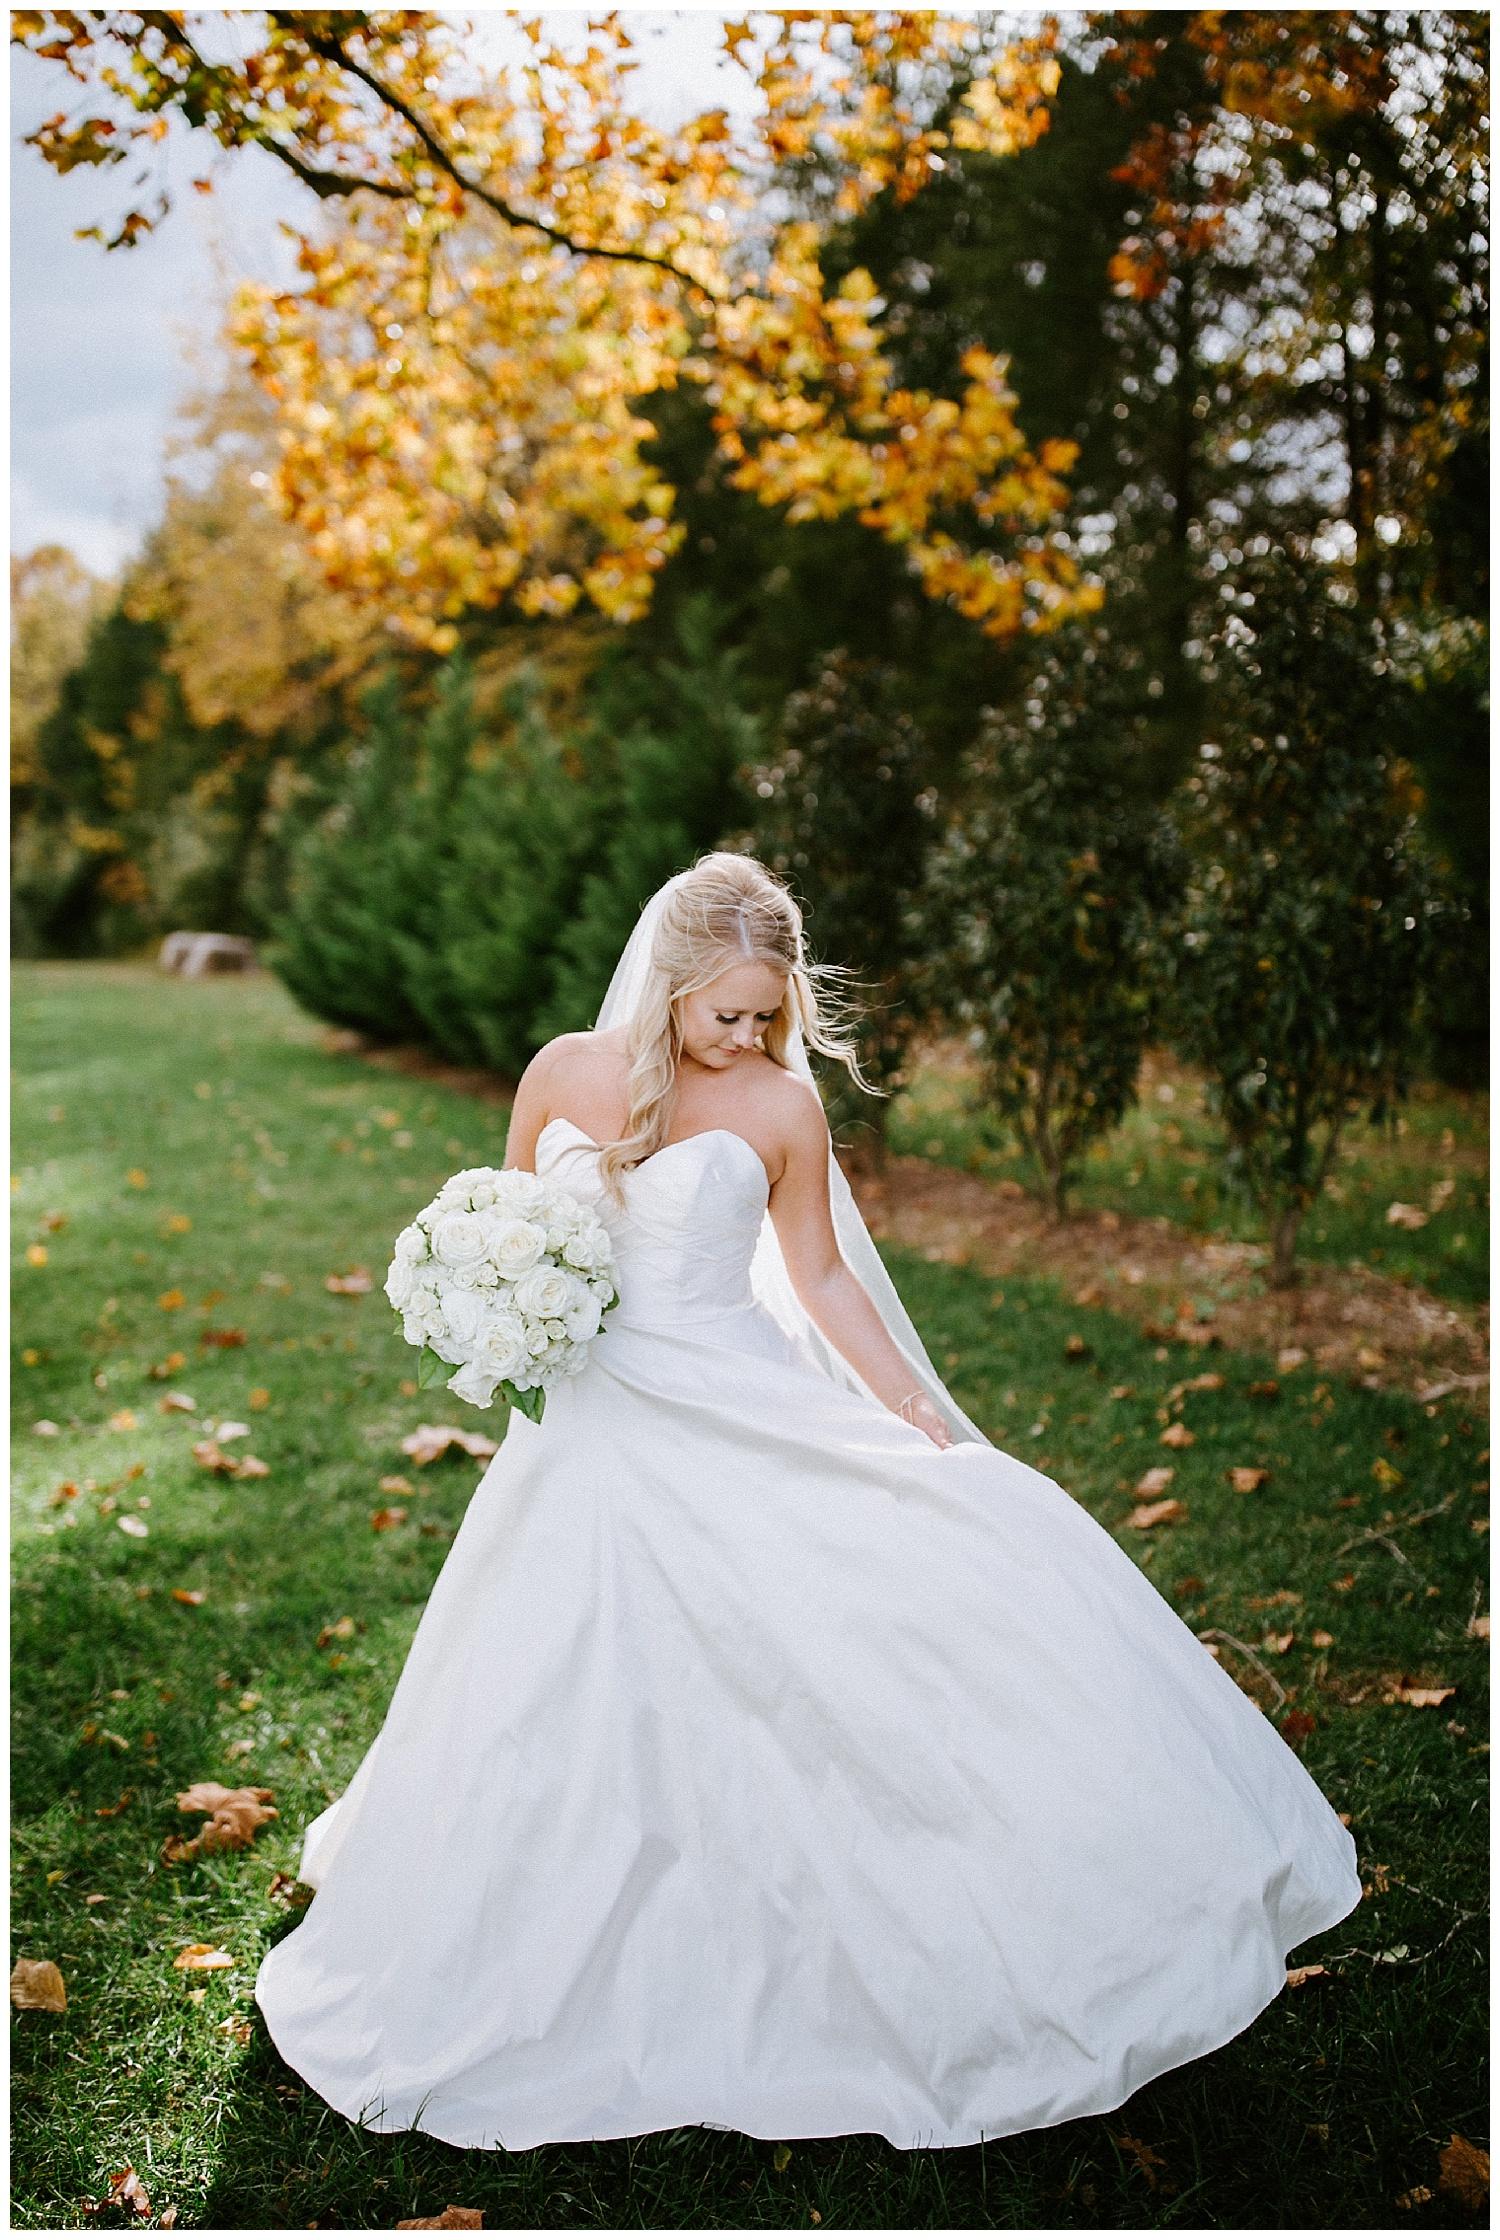 classy-wedding-sycamore_farms-nashville-tn2019-01-22_0038.jpg